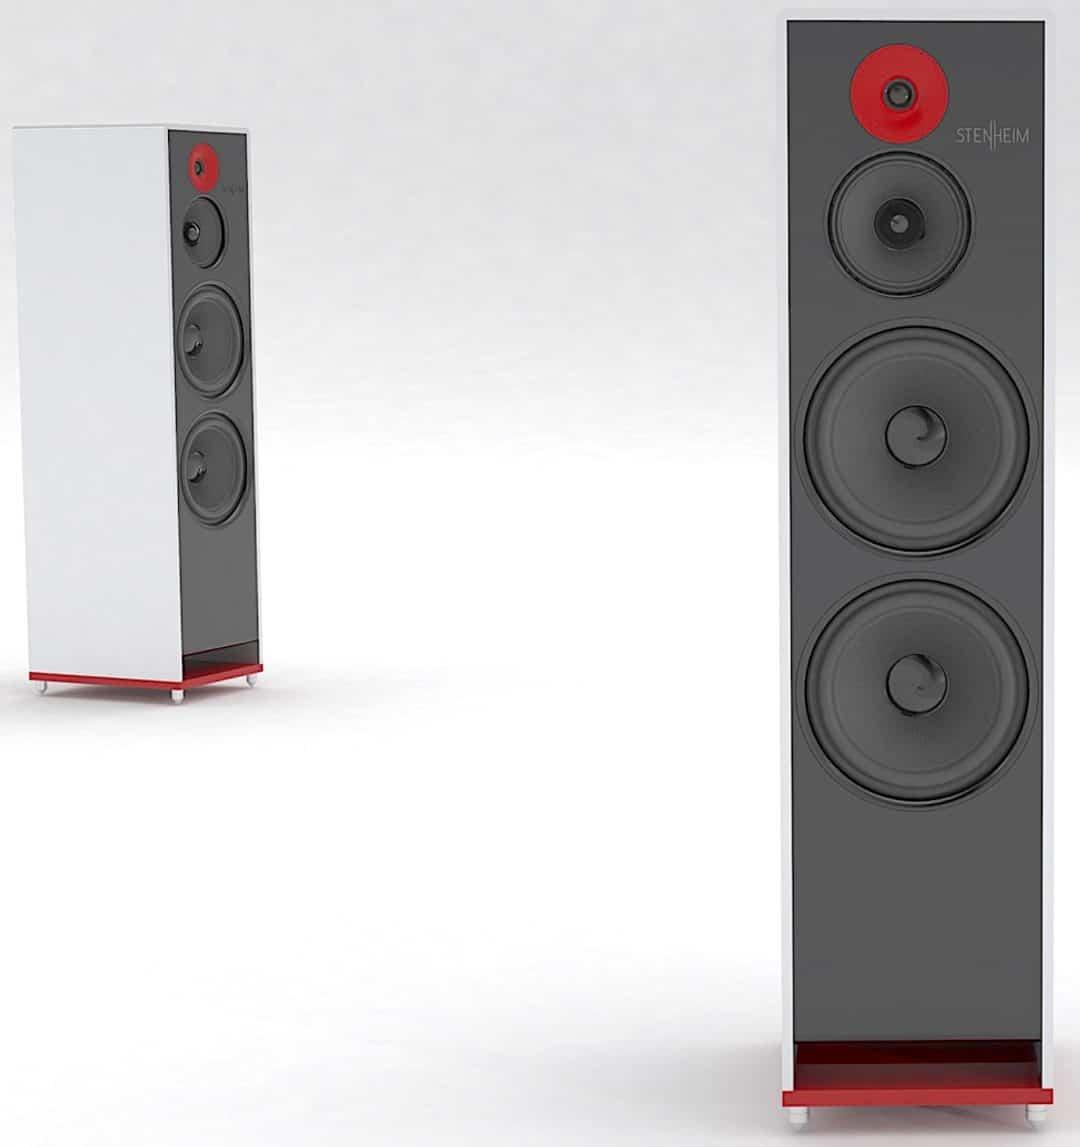 Alumine Three Speakers From Stenheim - The Audiophile Man